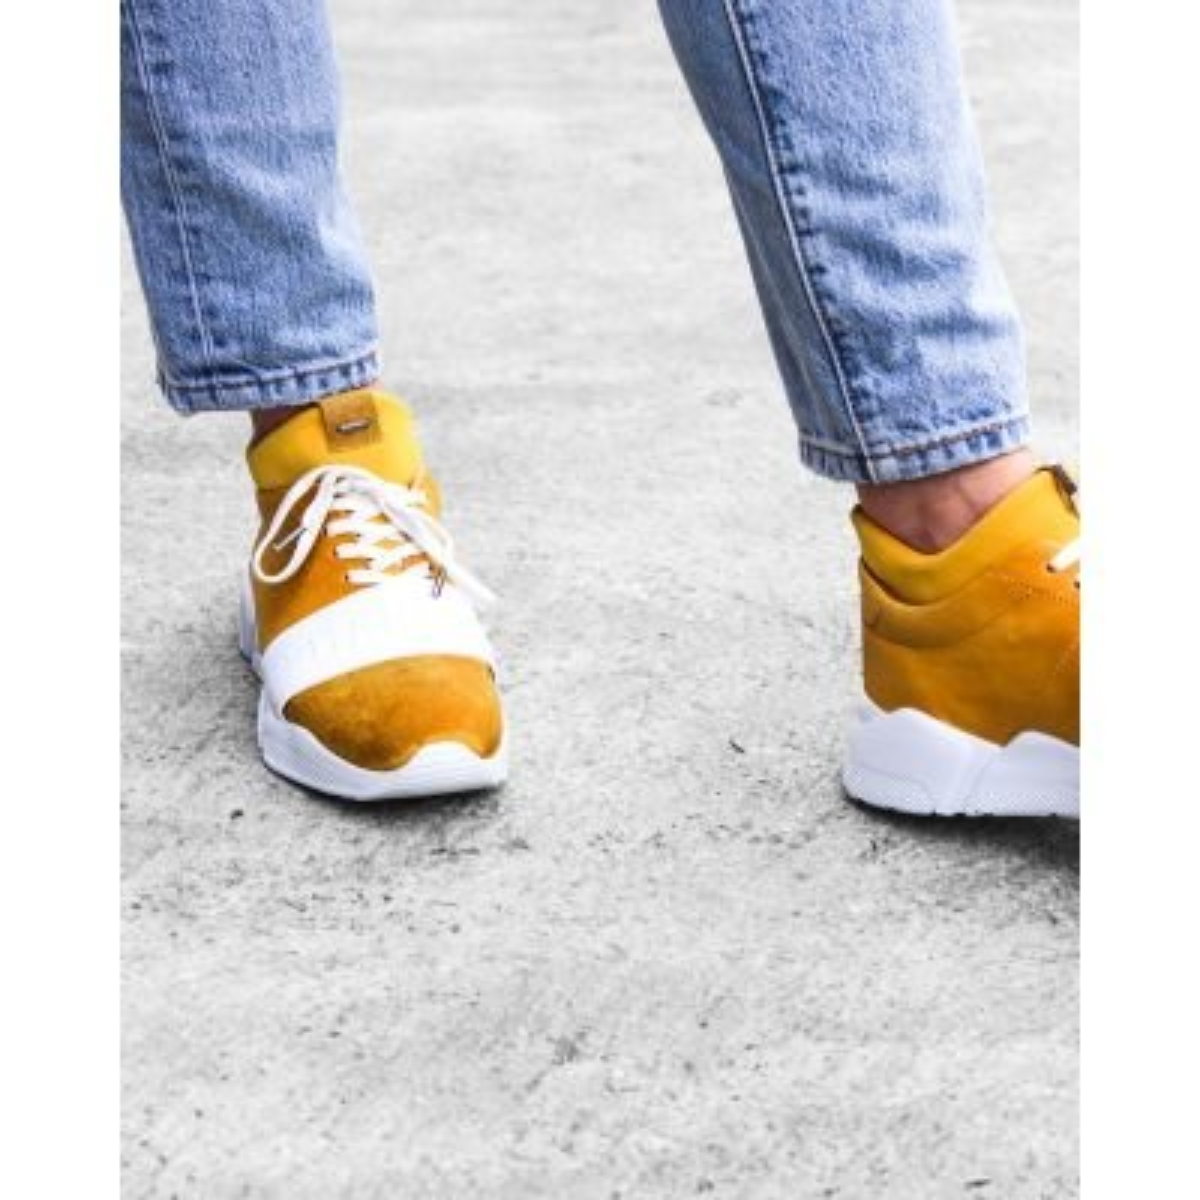 Sneaker-Glattleder-mit-Neoprensocke-Gelb